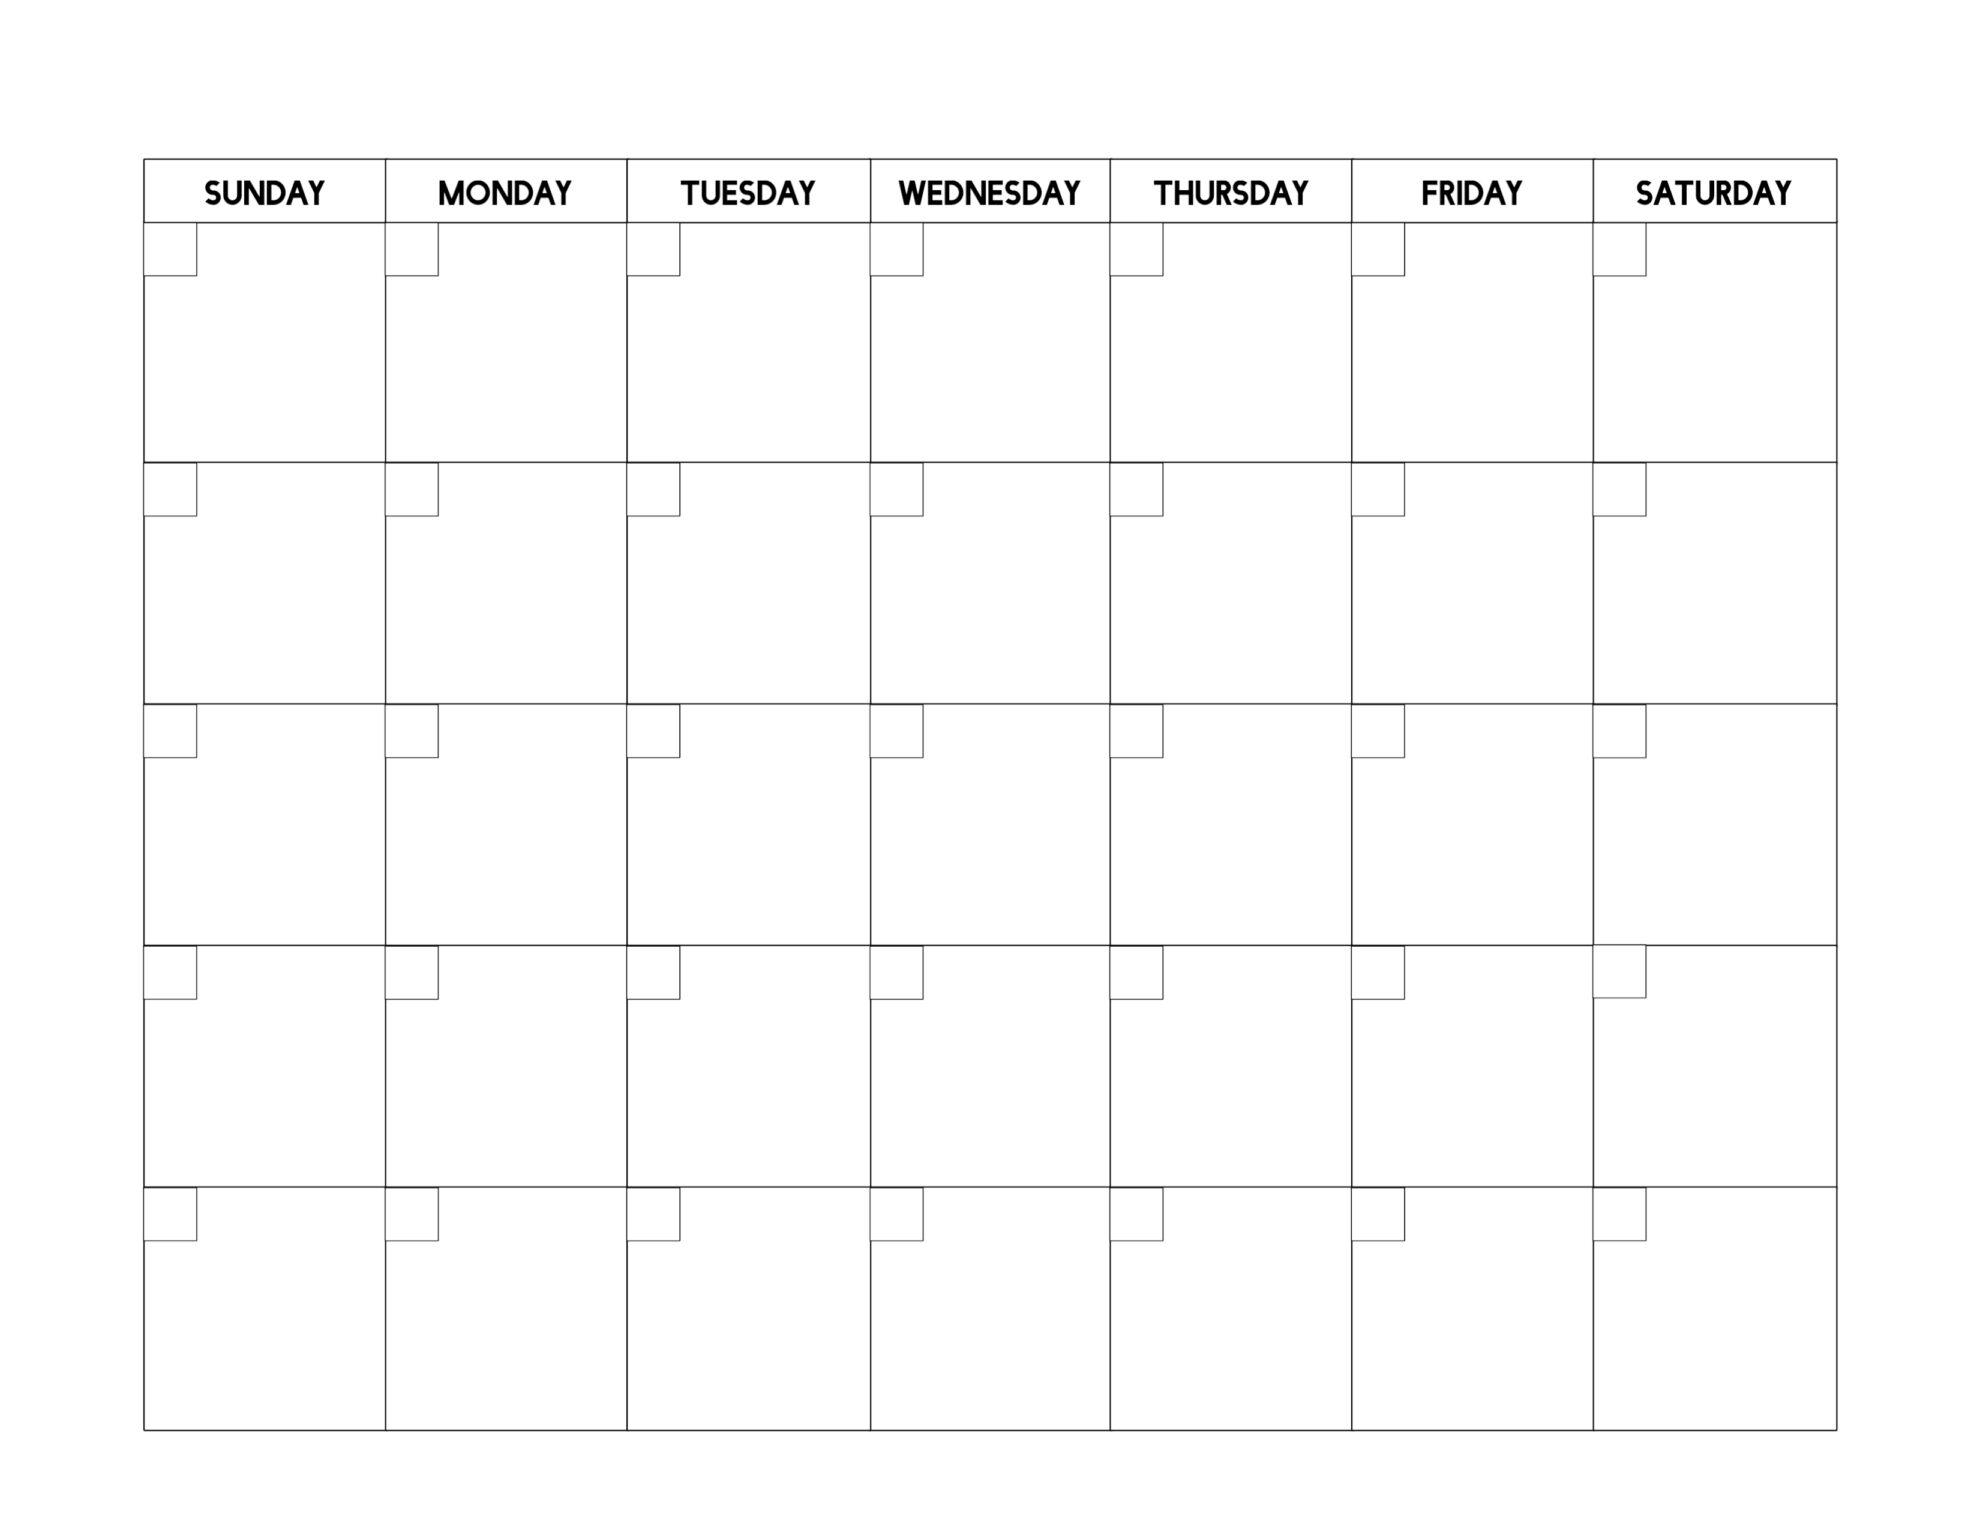 Free Printable Blank Calendar Template | Paper Trail Design in Free Fill In Printable Calendars